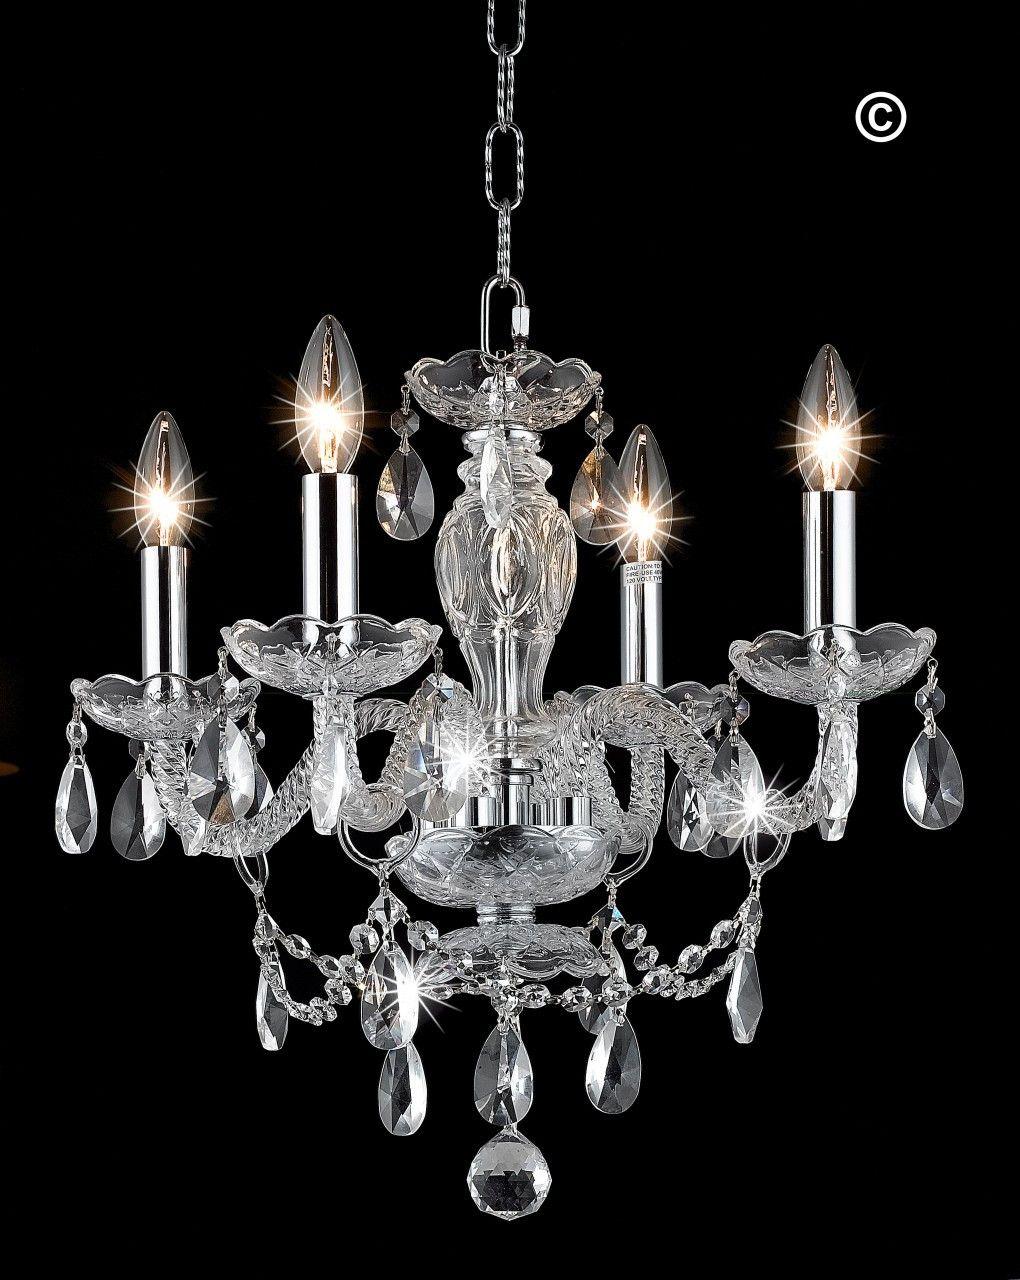 Le Boheme 4 Arm Crystal Chandelier Chrome Elegant Lighting